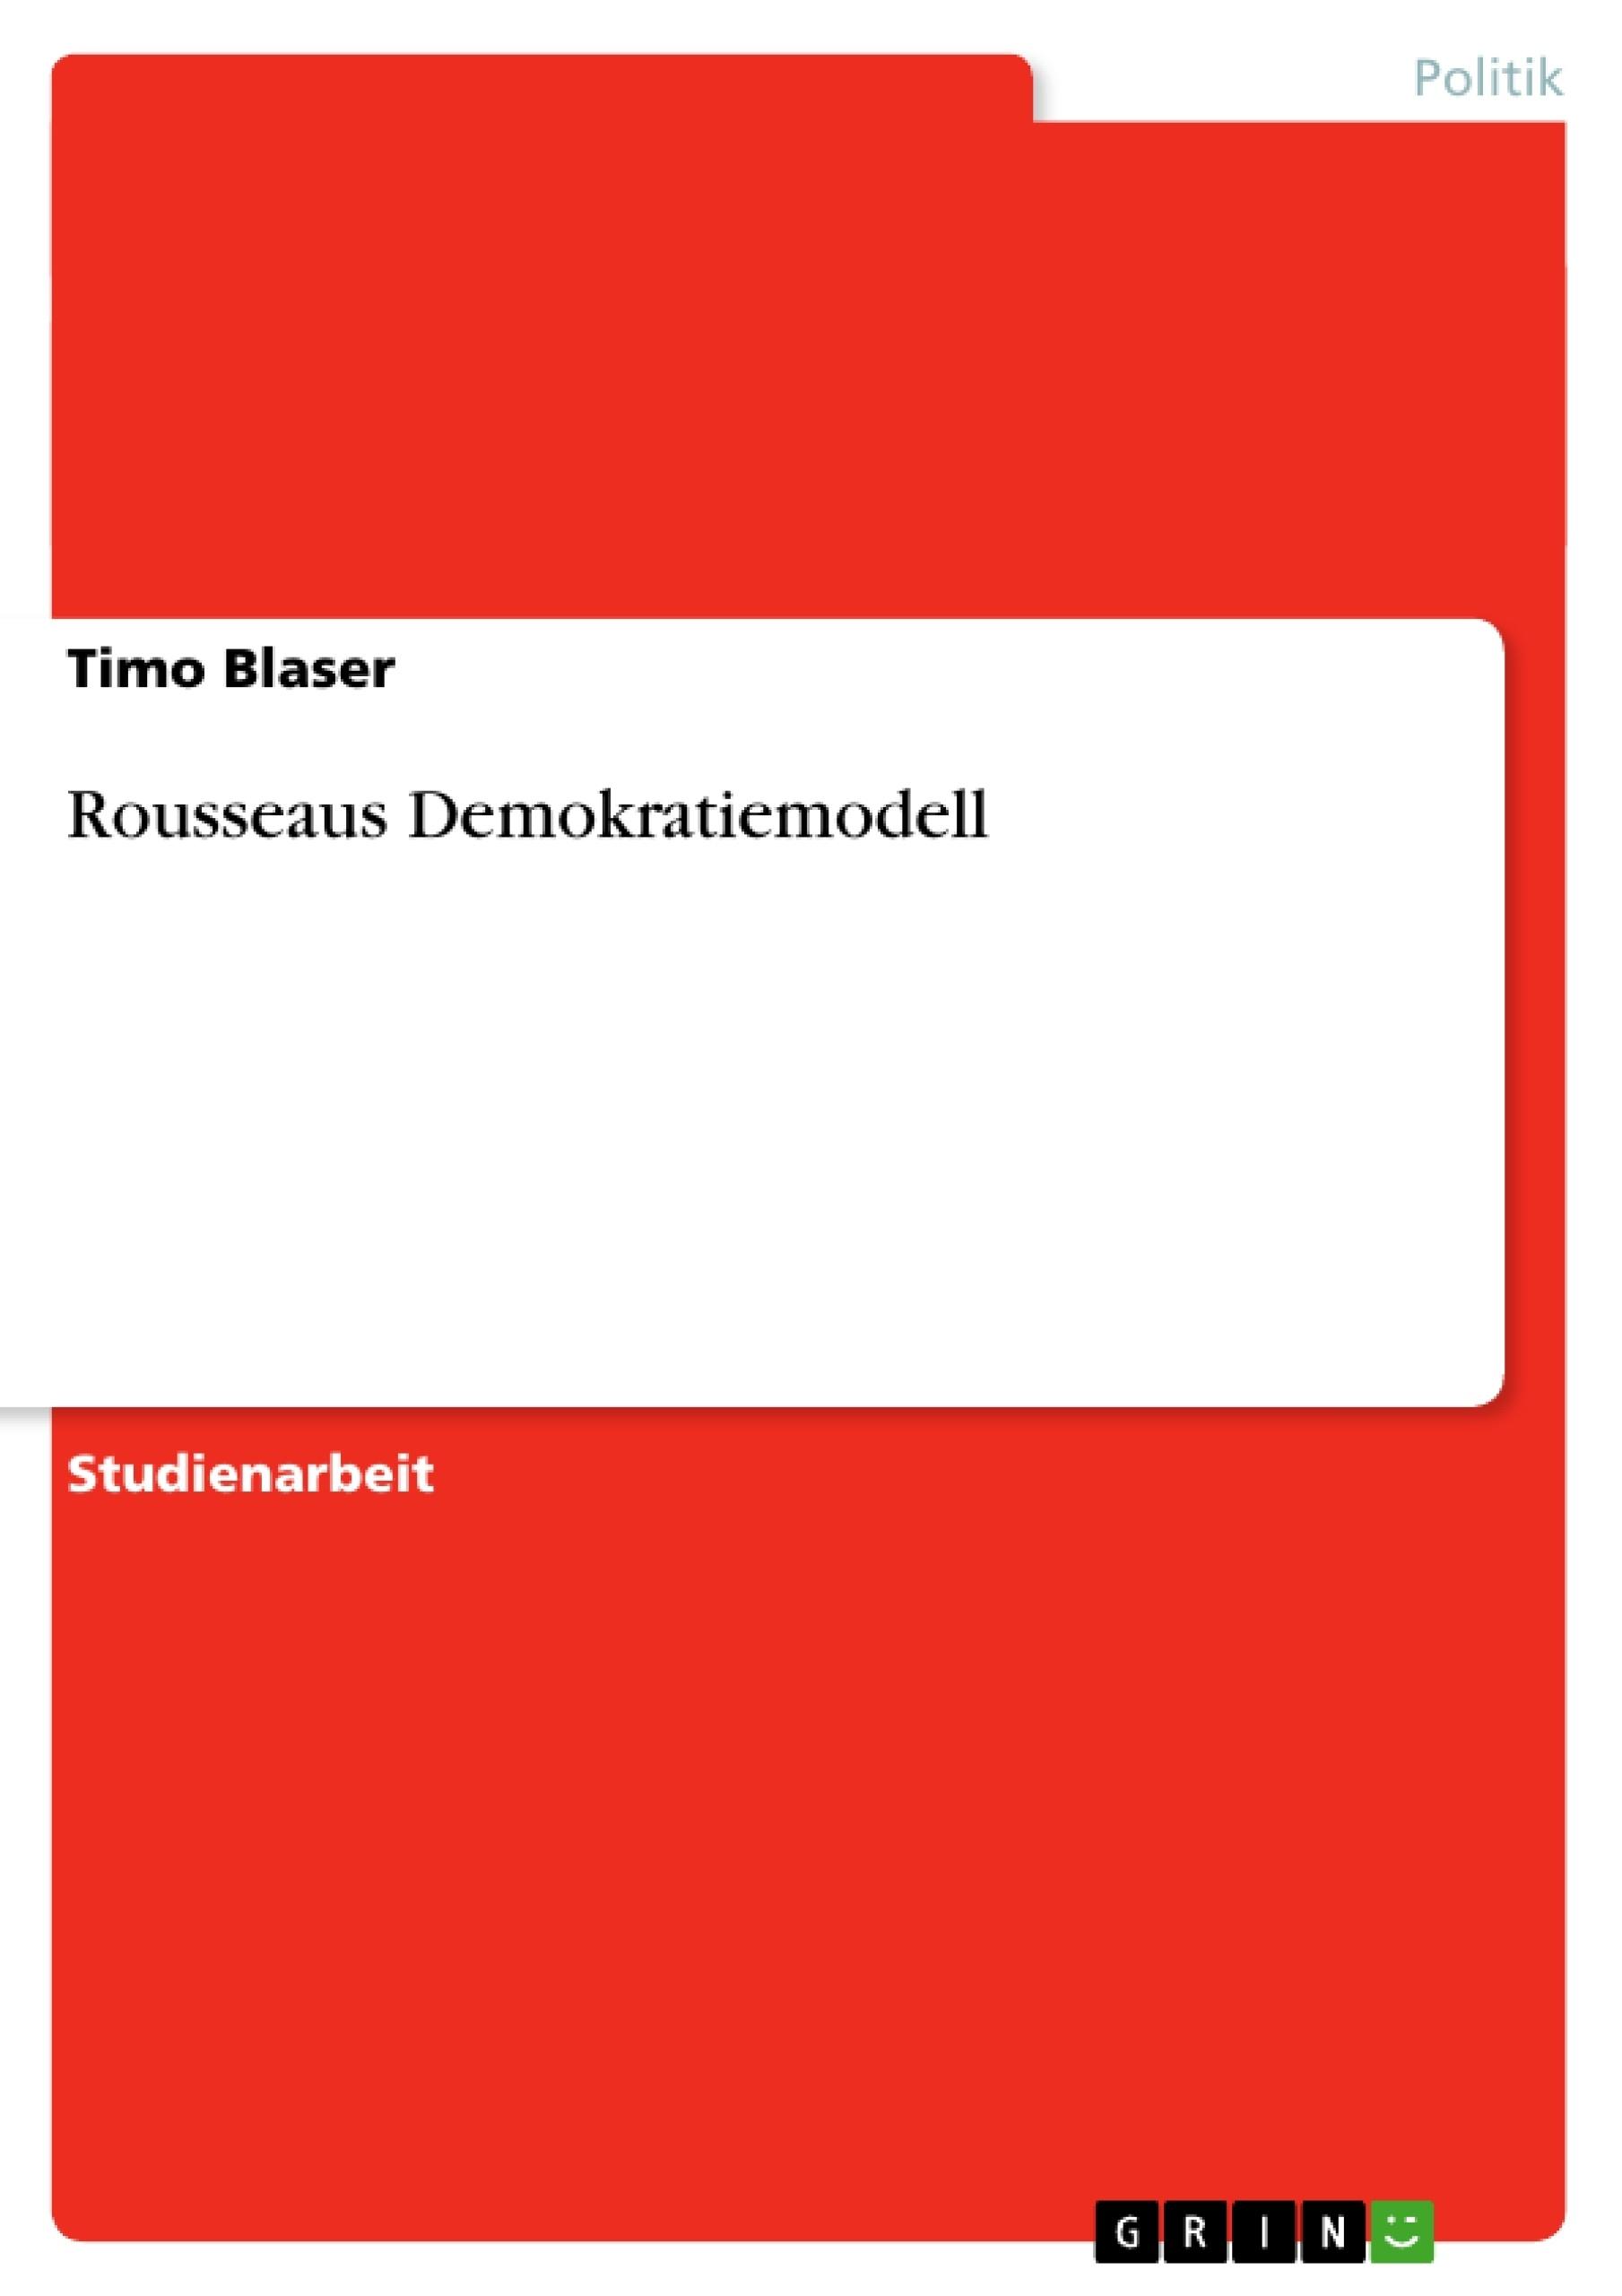 Titel: Rousseaus Demokratiemodell